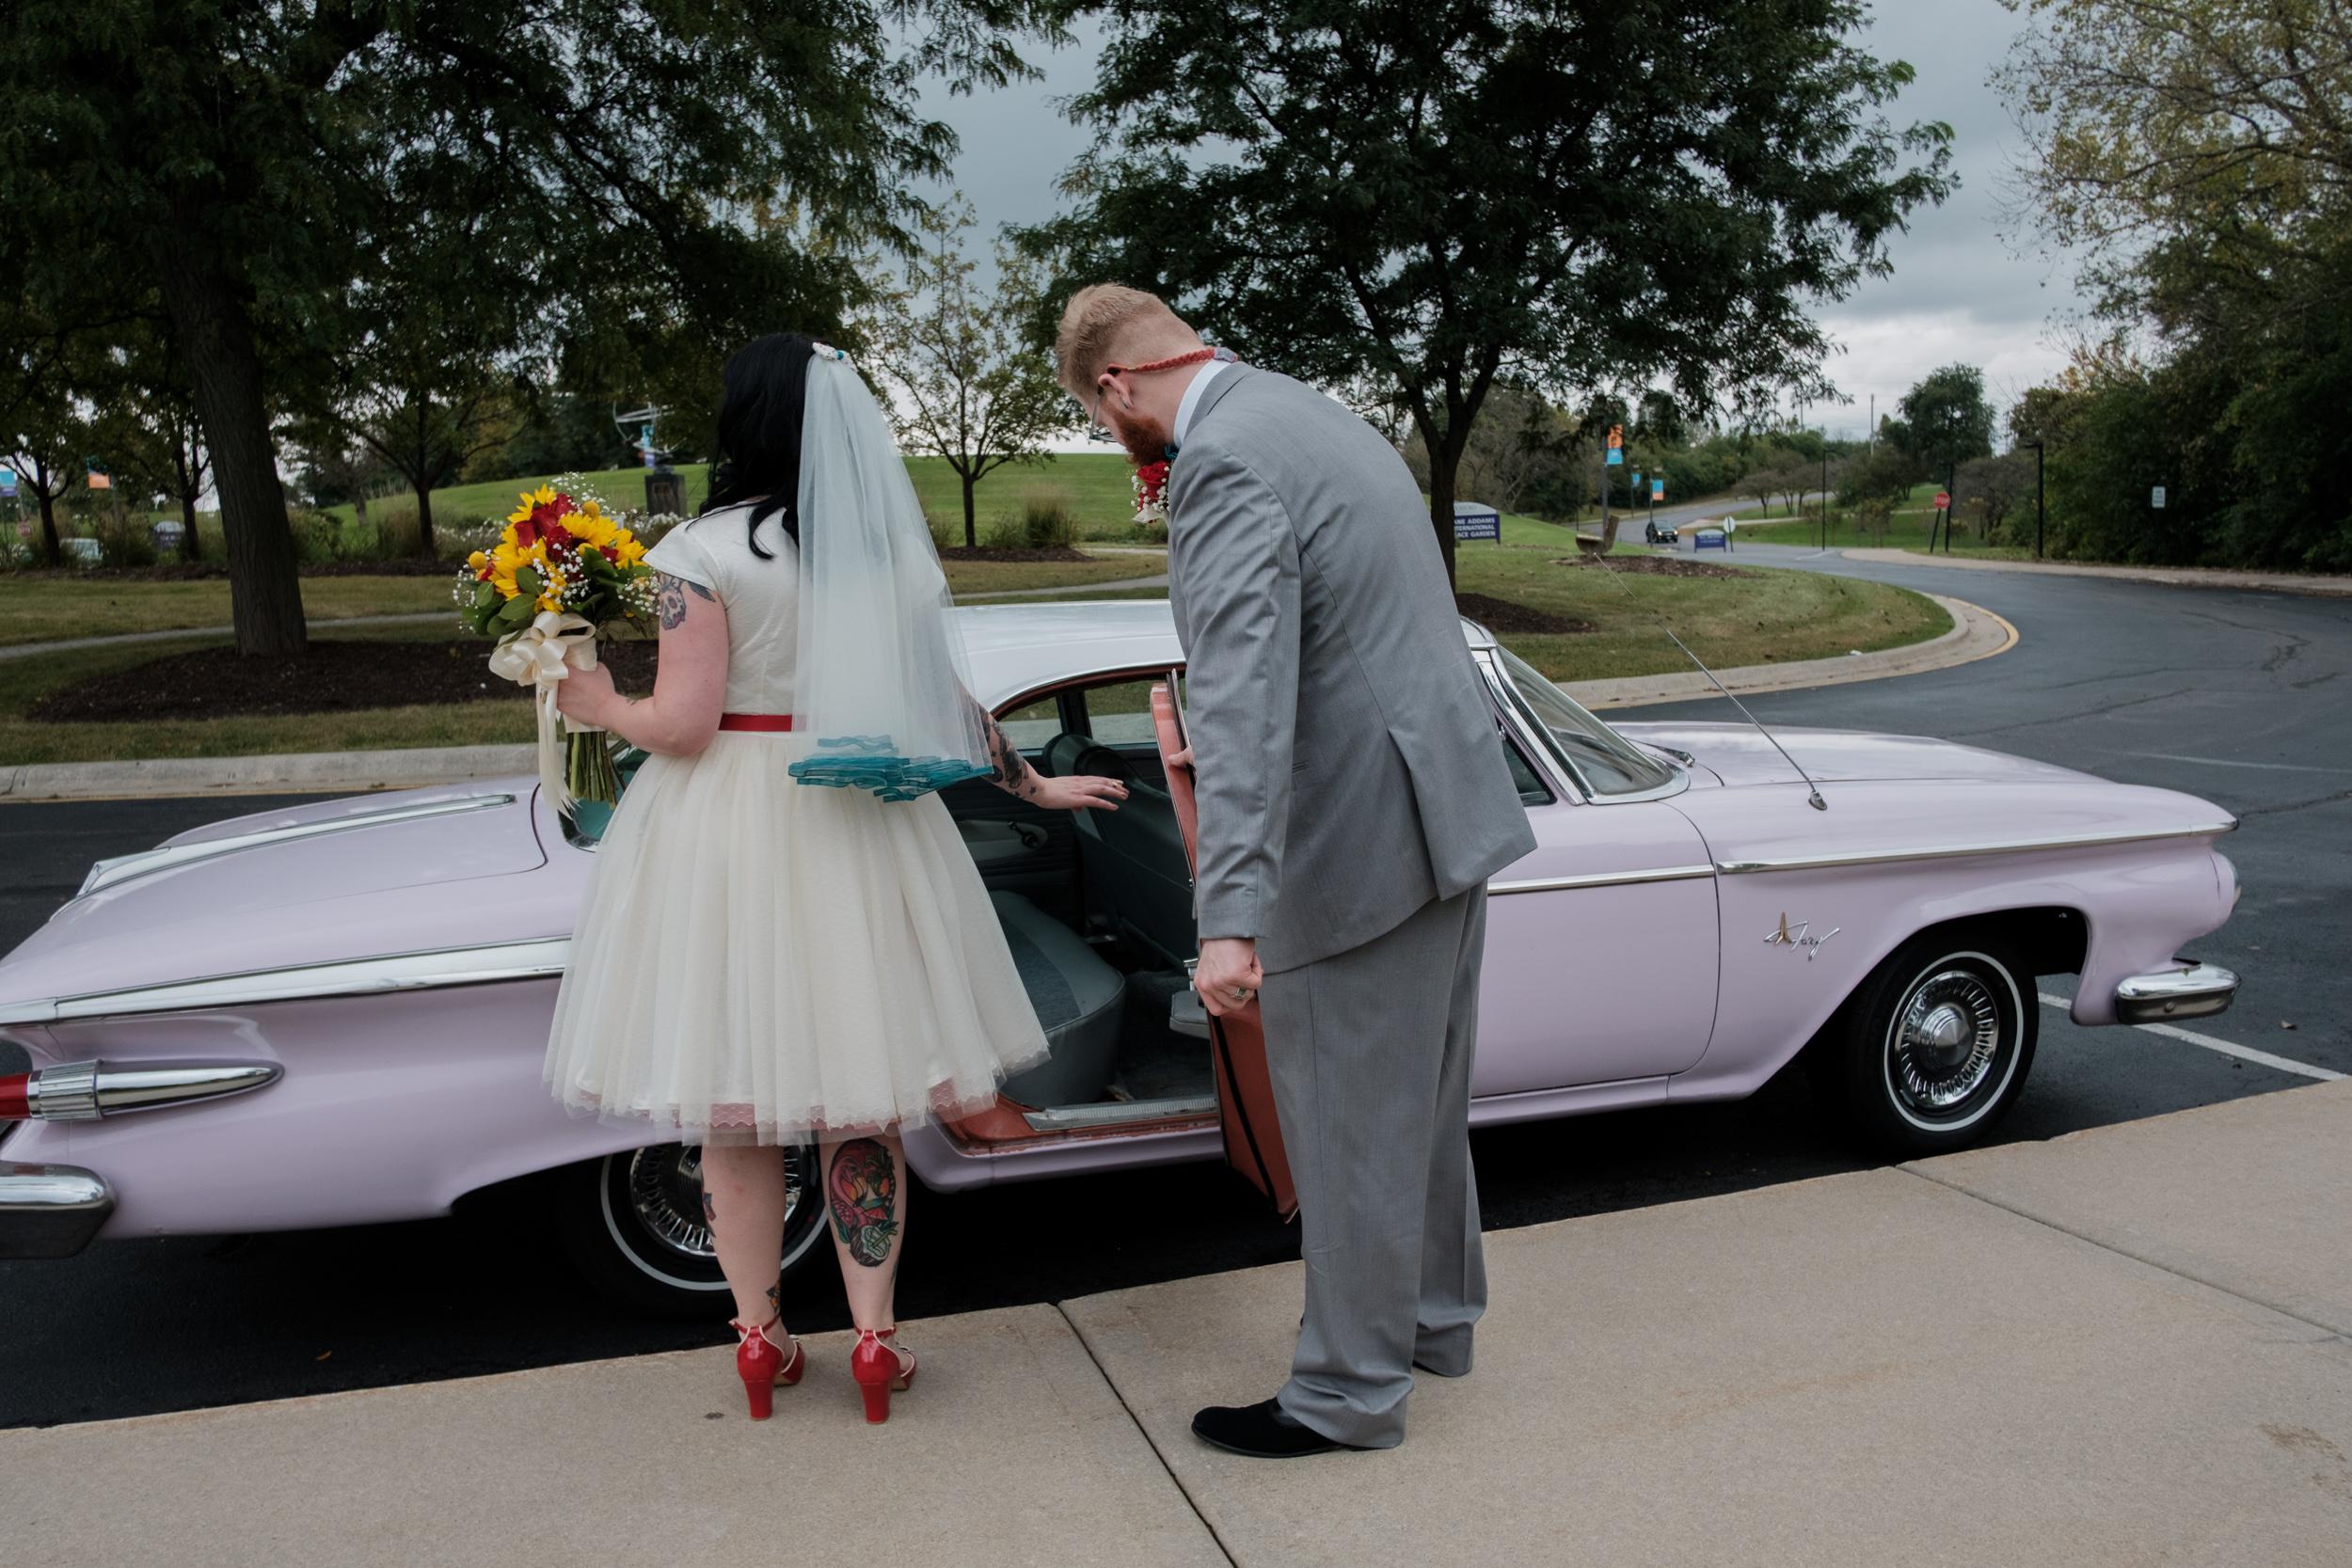 Christian & Sarah wedding photography by Brian milo-180.jpg